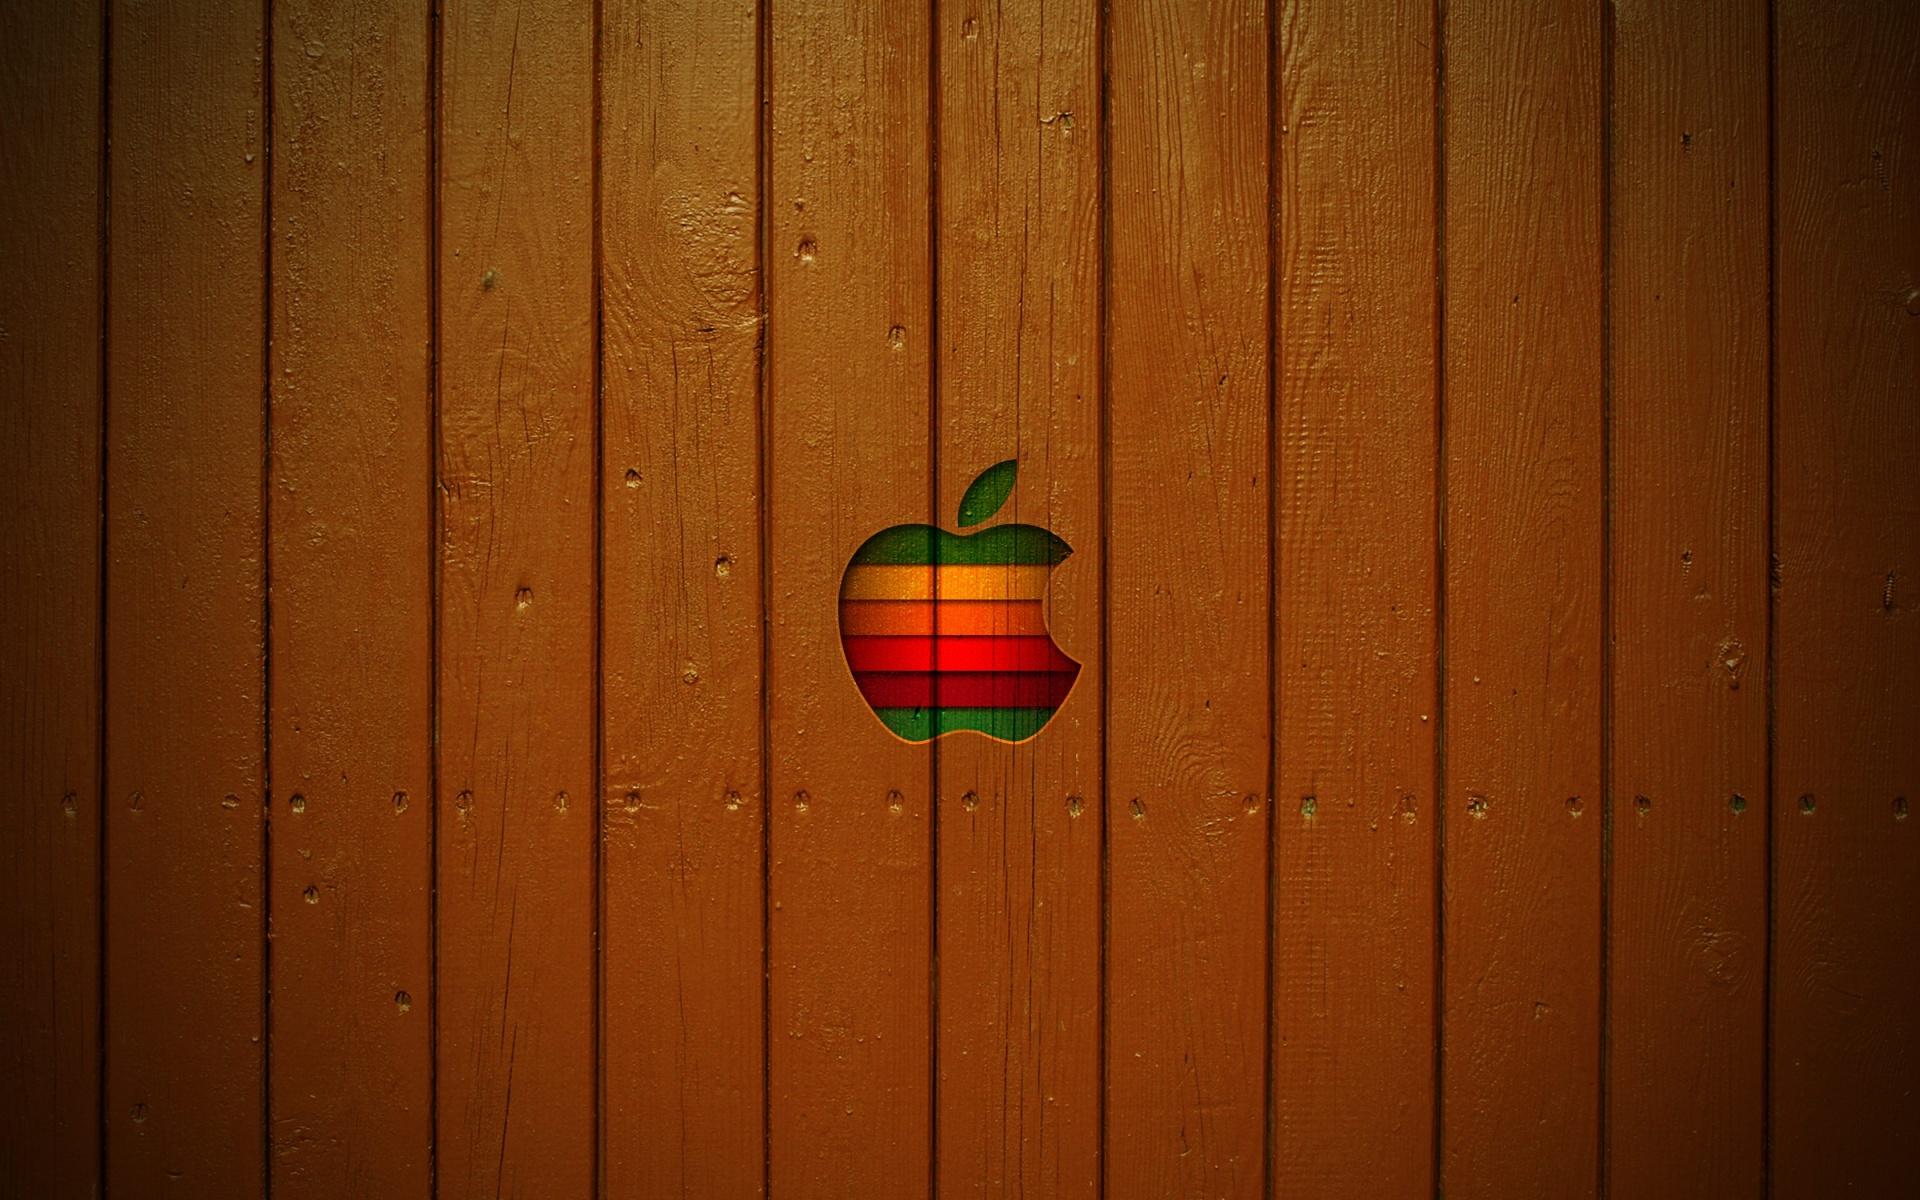 Inspriational Quotes Wallpaper For Mac Hd Macbook Air Logo Wallpapers Pixelstalk Net